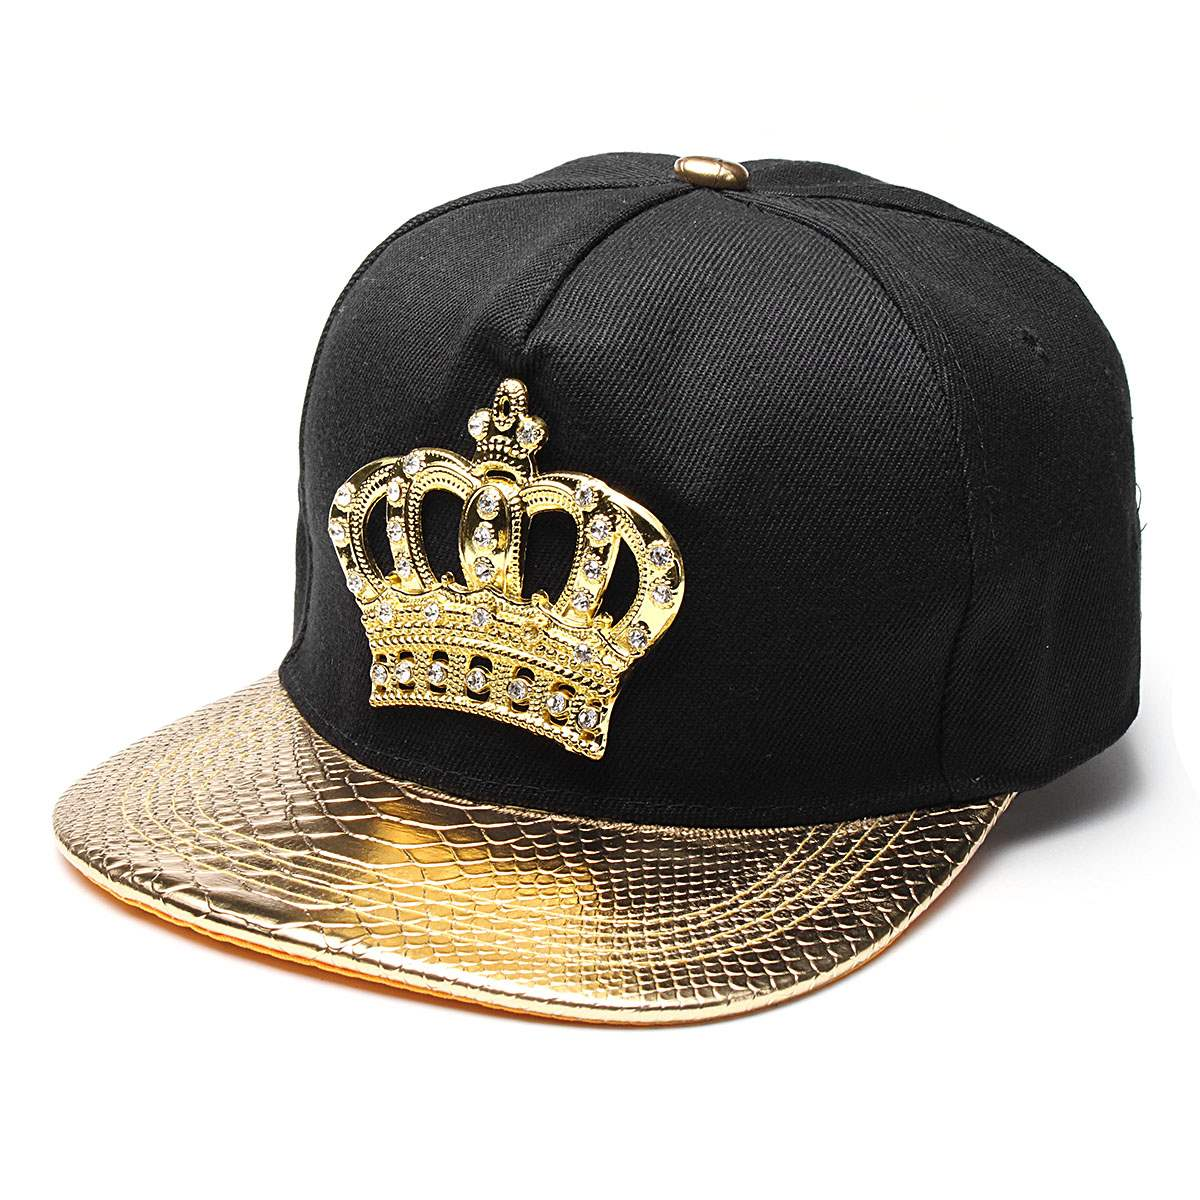 Men Women's Snapback Hat KING Crown Baseball Cap Adjustable Hip Hop Dad Hats Gold/Silver/Black Peaked Rhinestone Crystal Sun Cap